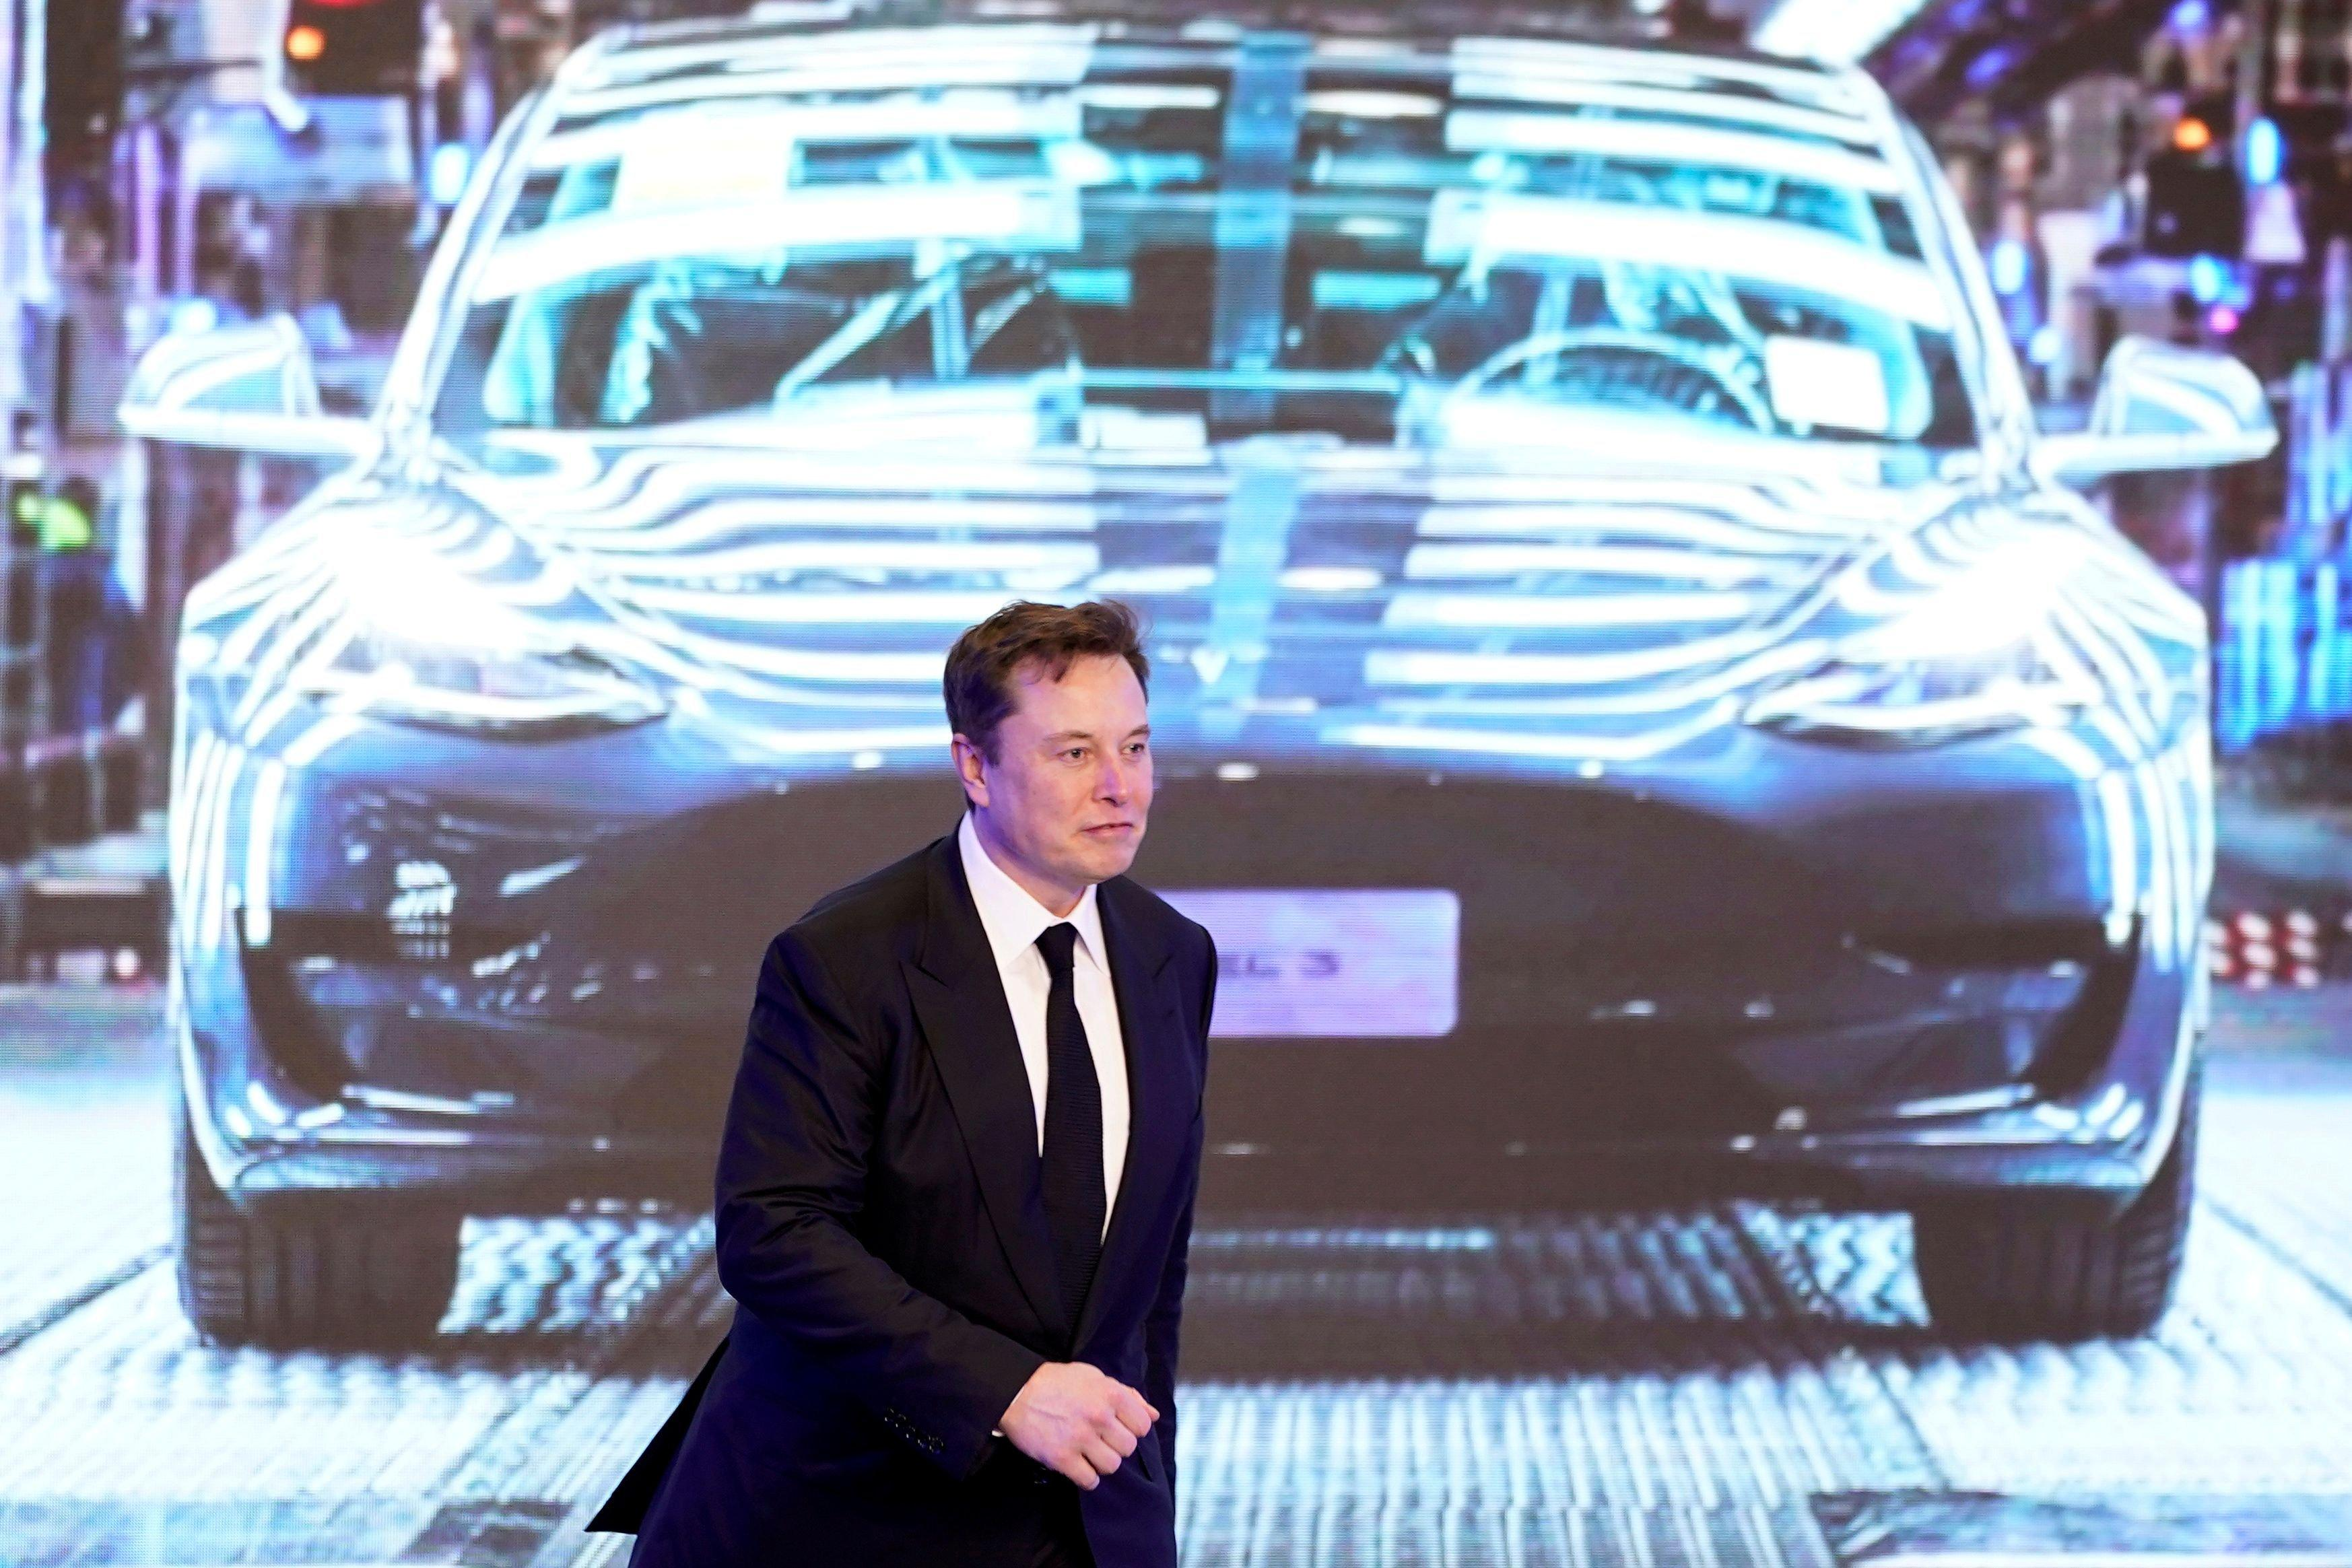 Musk dreht an der Preisschraube: Tesla schon ab 21.000 Euro